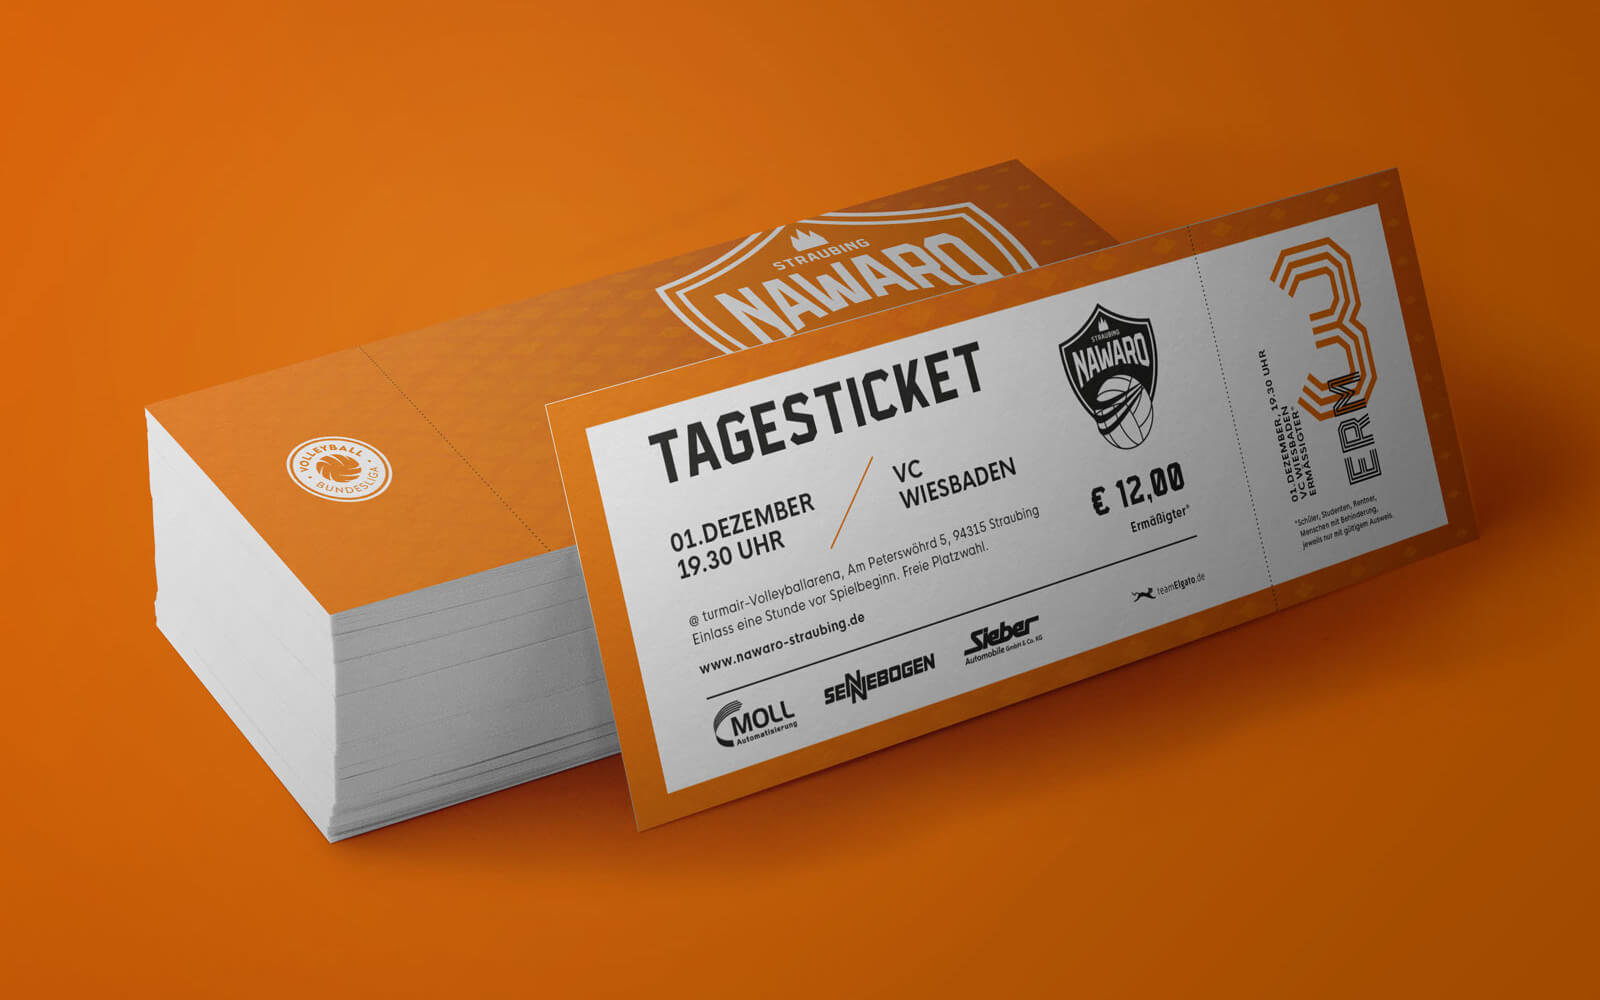 NawaRo Straubing – Tickets